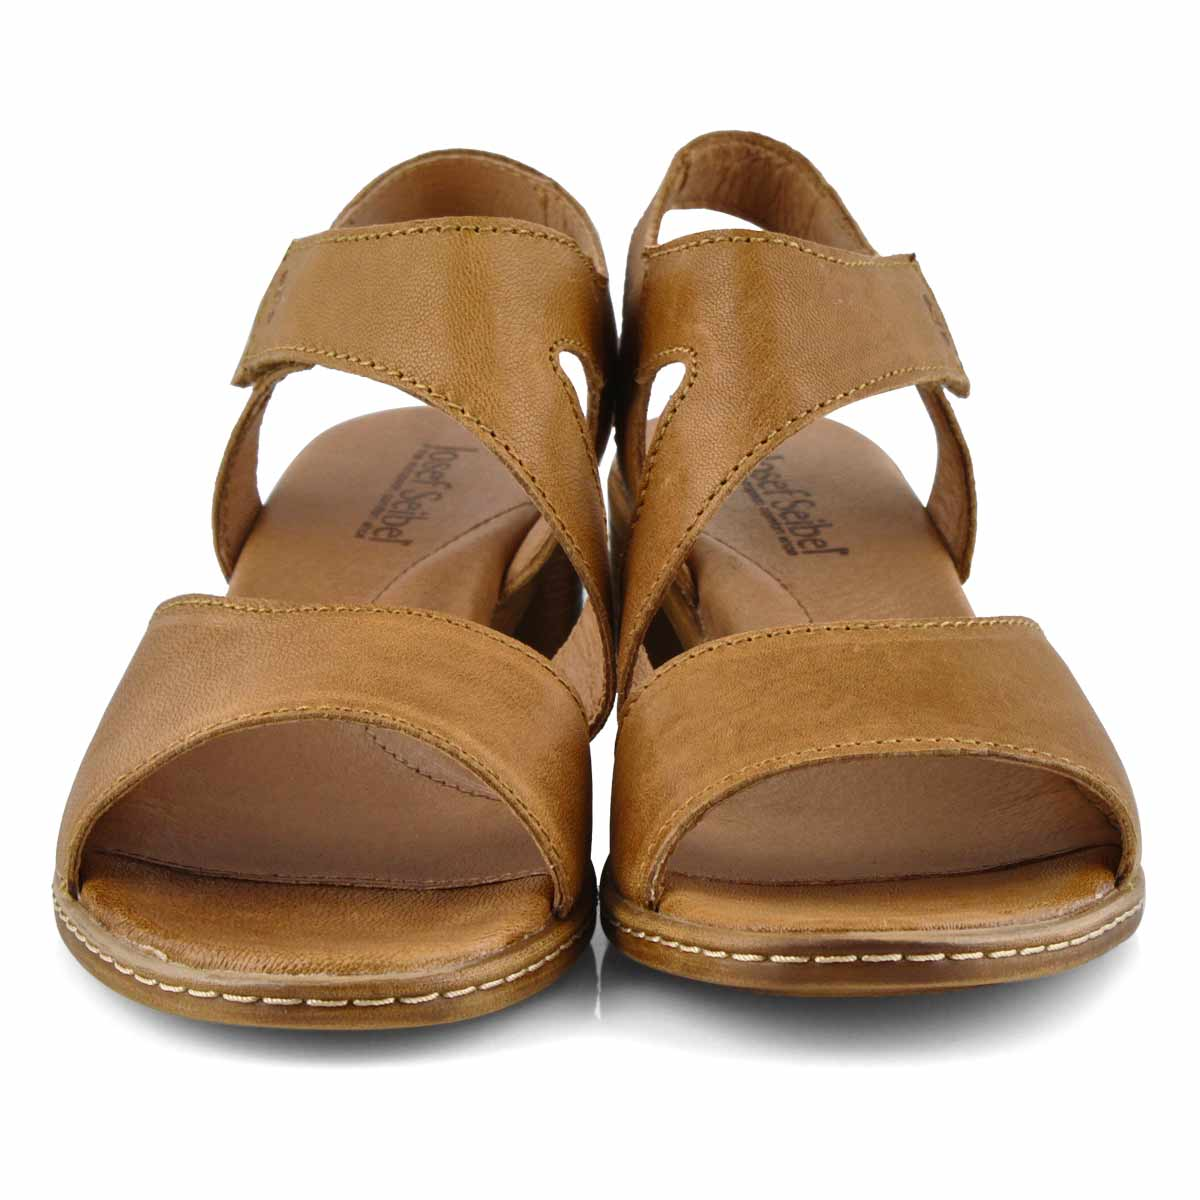 Women's Juna 02 Heels Sandal - Camel